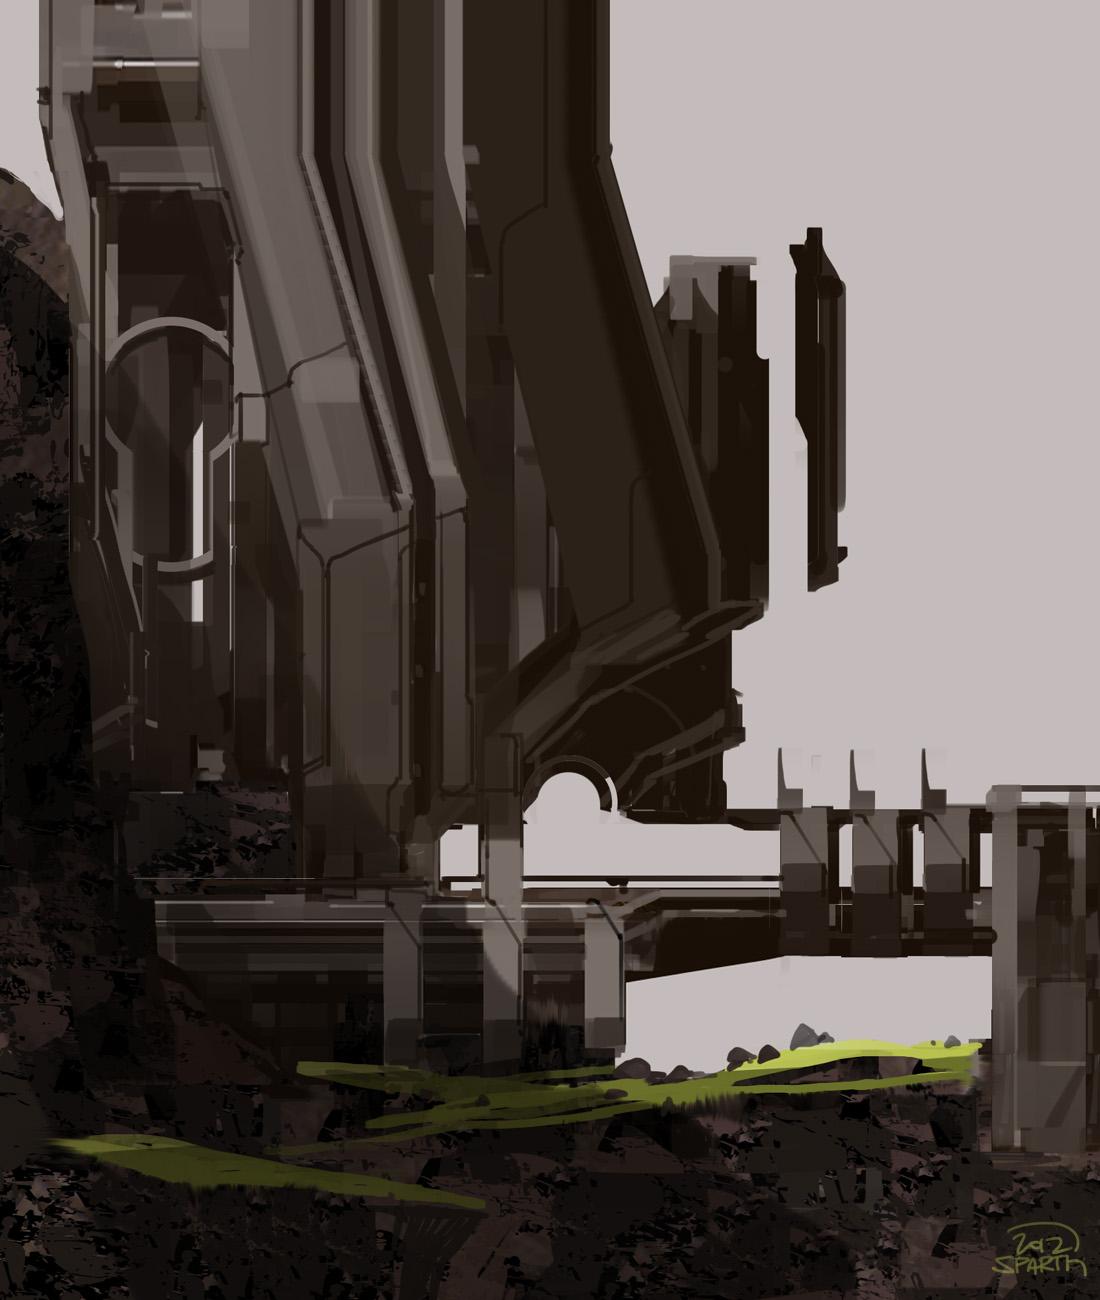 Halo 4 DLC Concept Art! A Hybrid Map of Narrows/Construct